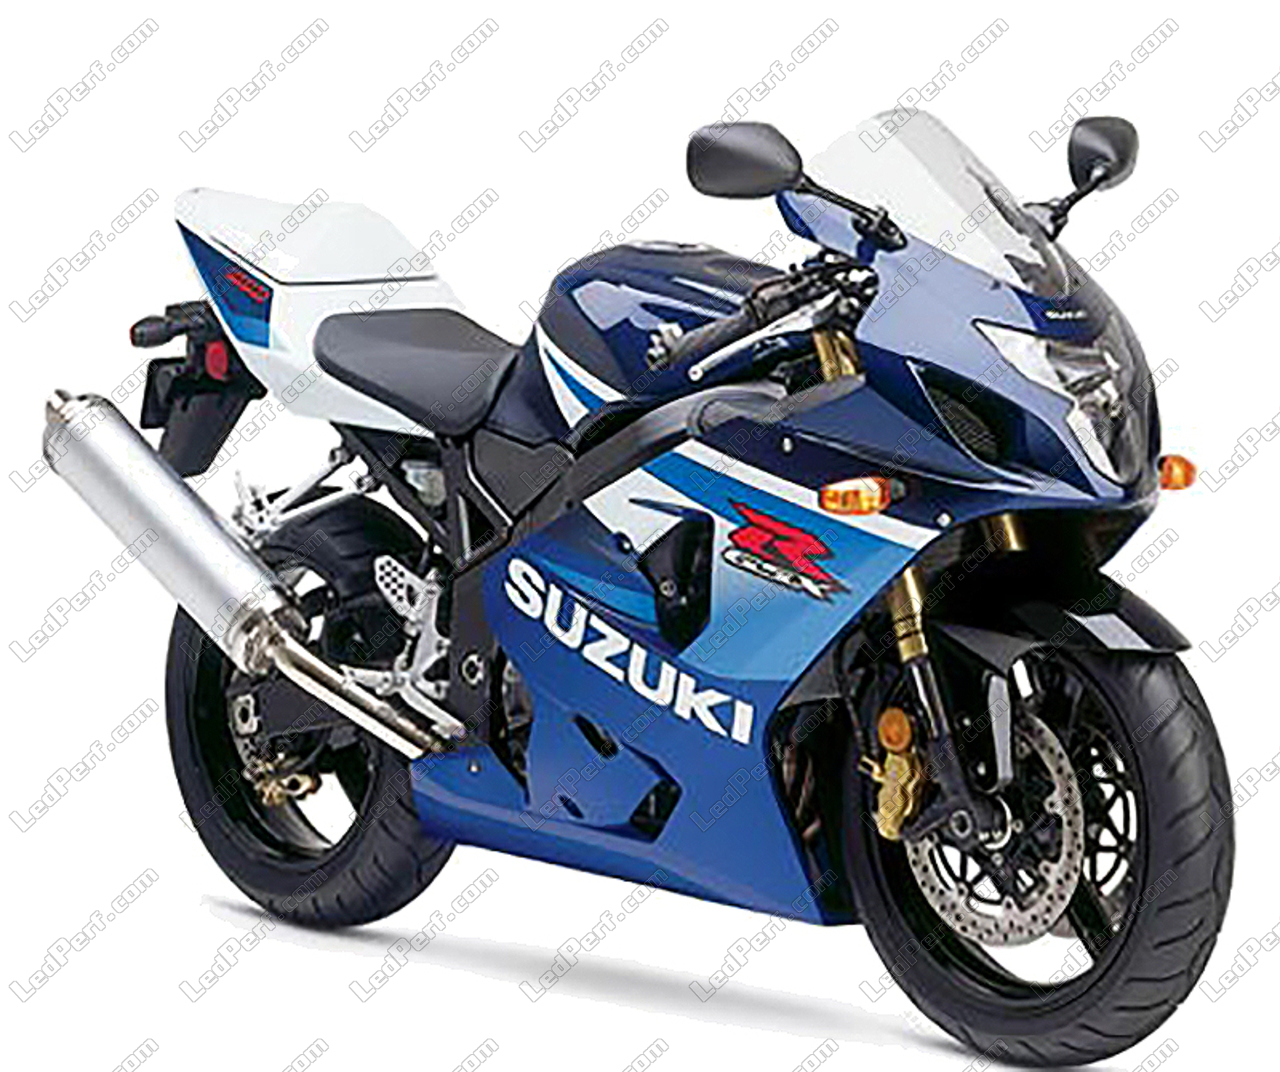 Additional Led Headlights For Motorcycle Suzuki Gsx R 600